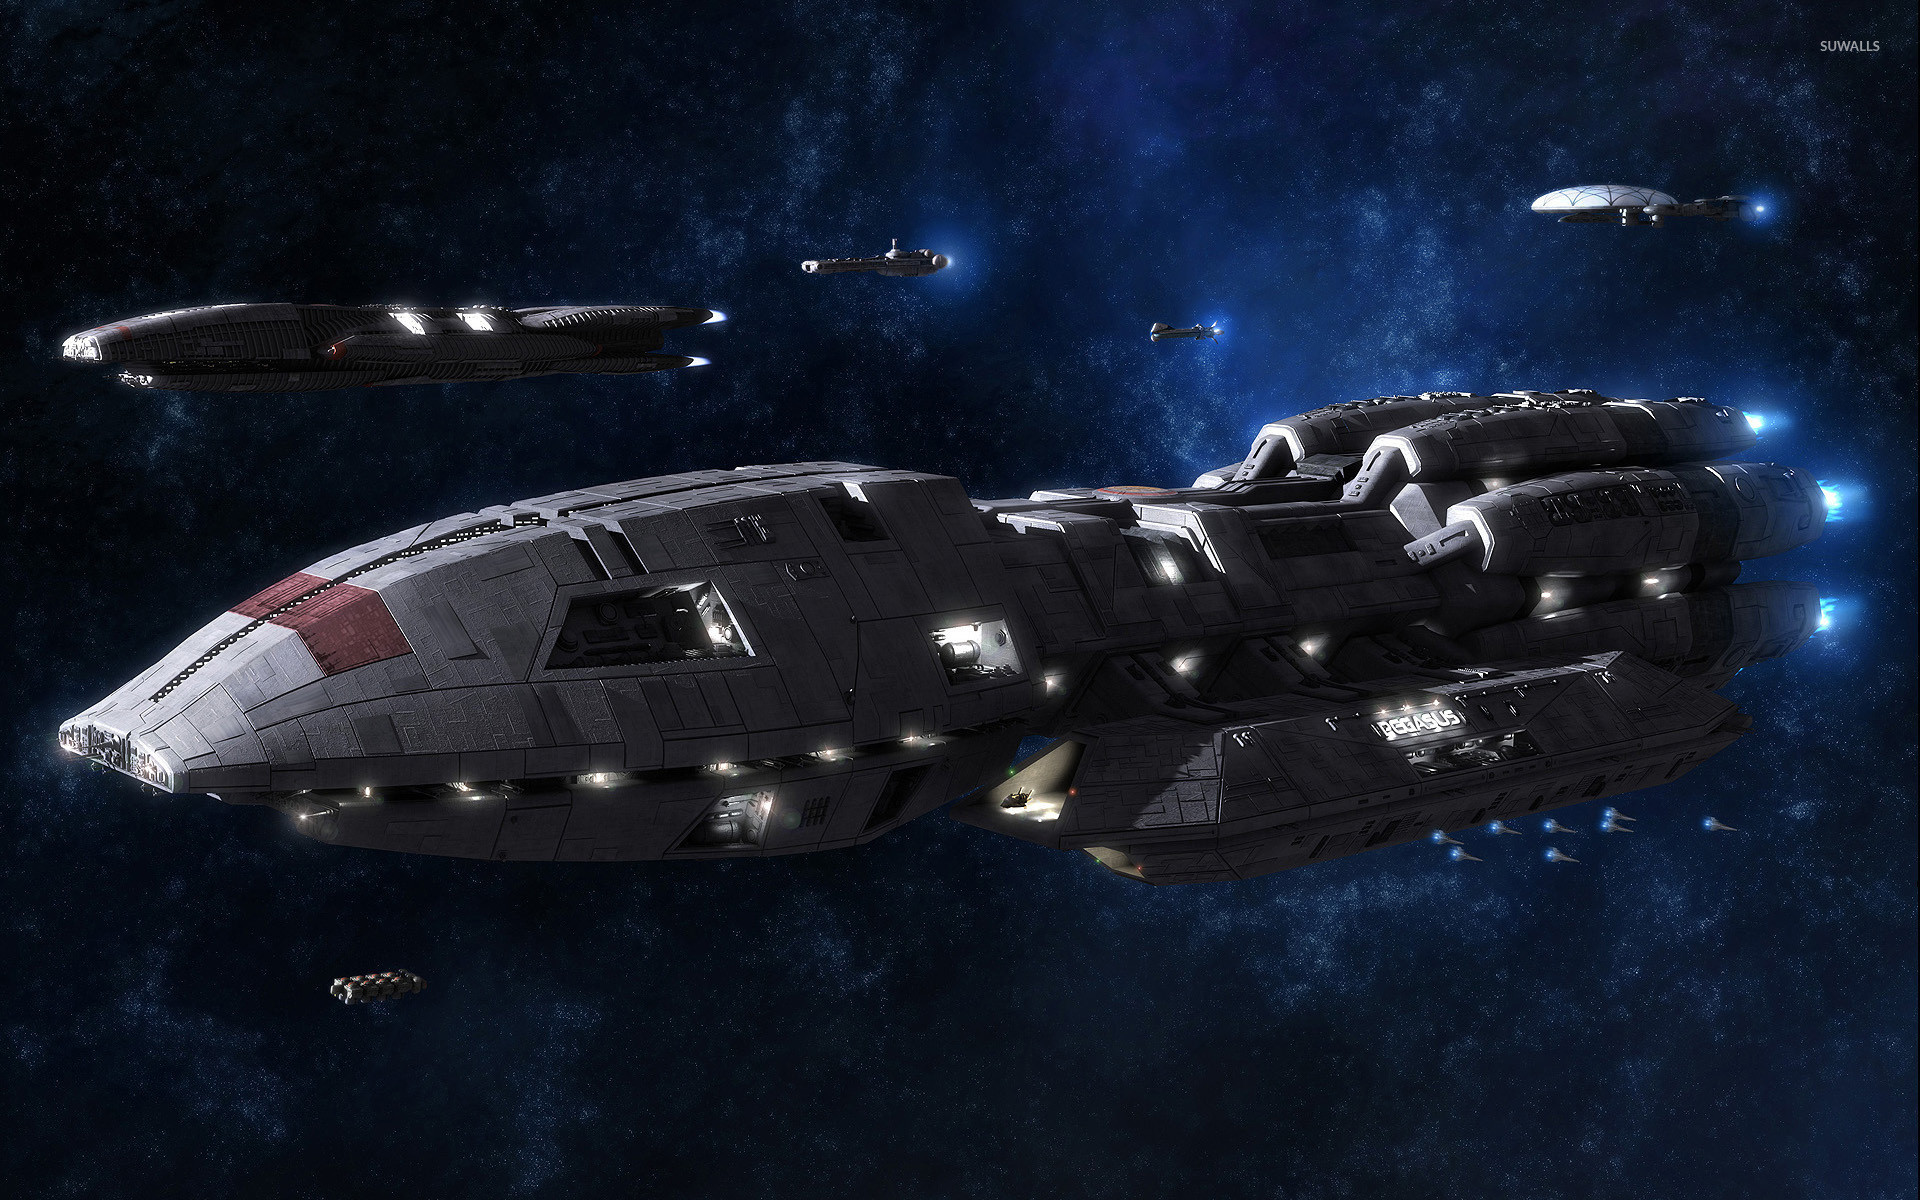 Battleships in Battlestar Galactica wallpaper